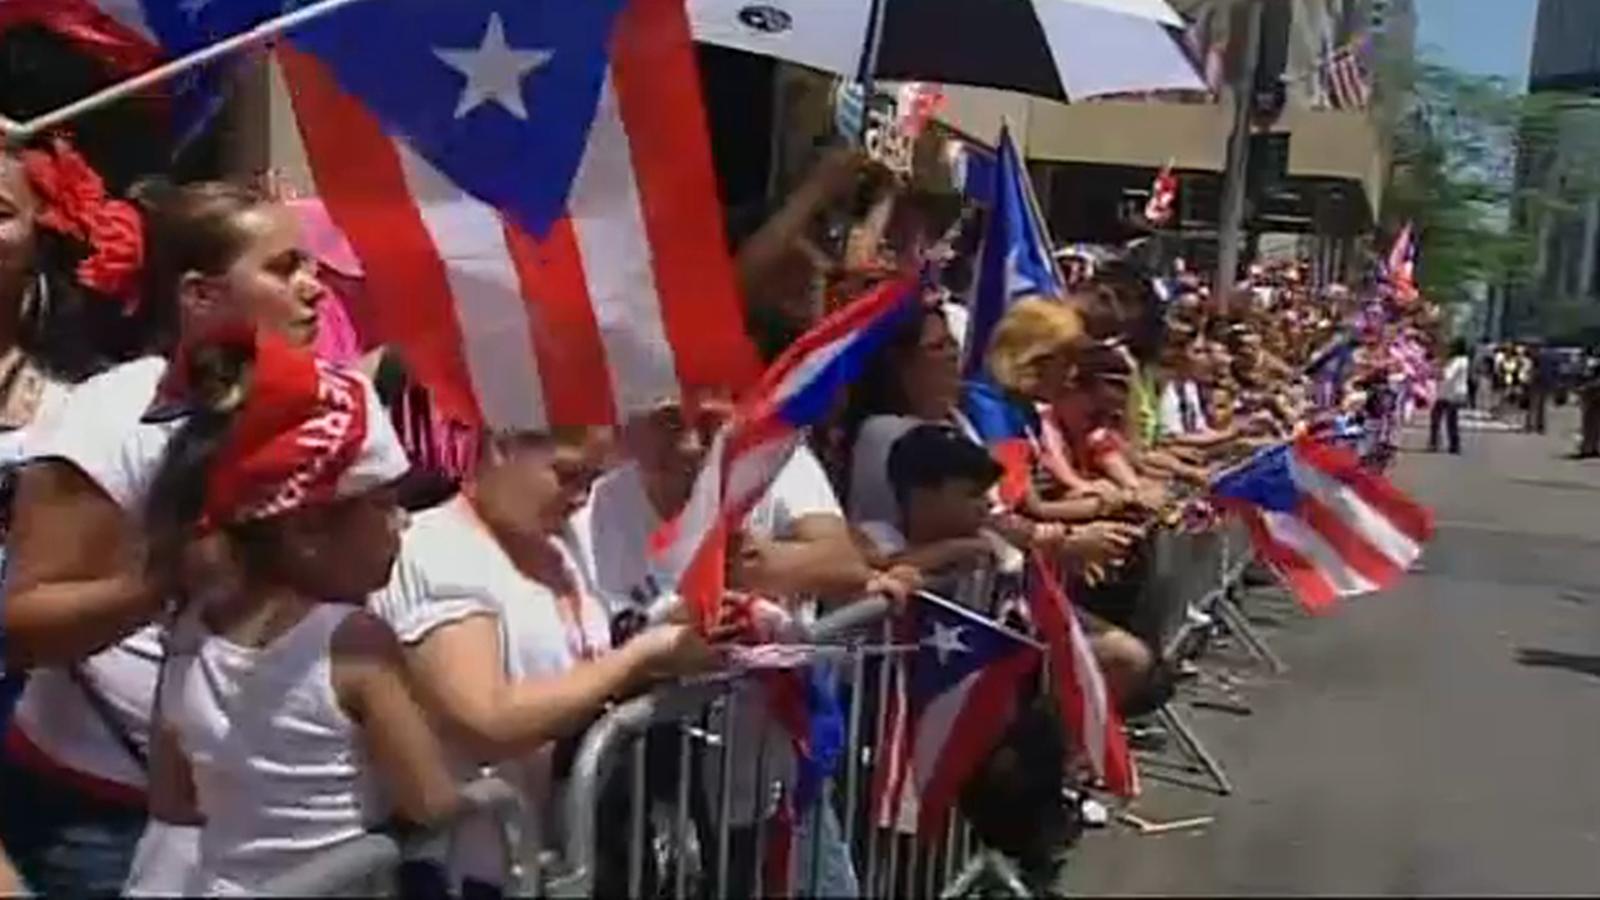 National Puerto Rican Day Parade set to make its way through Midtown